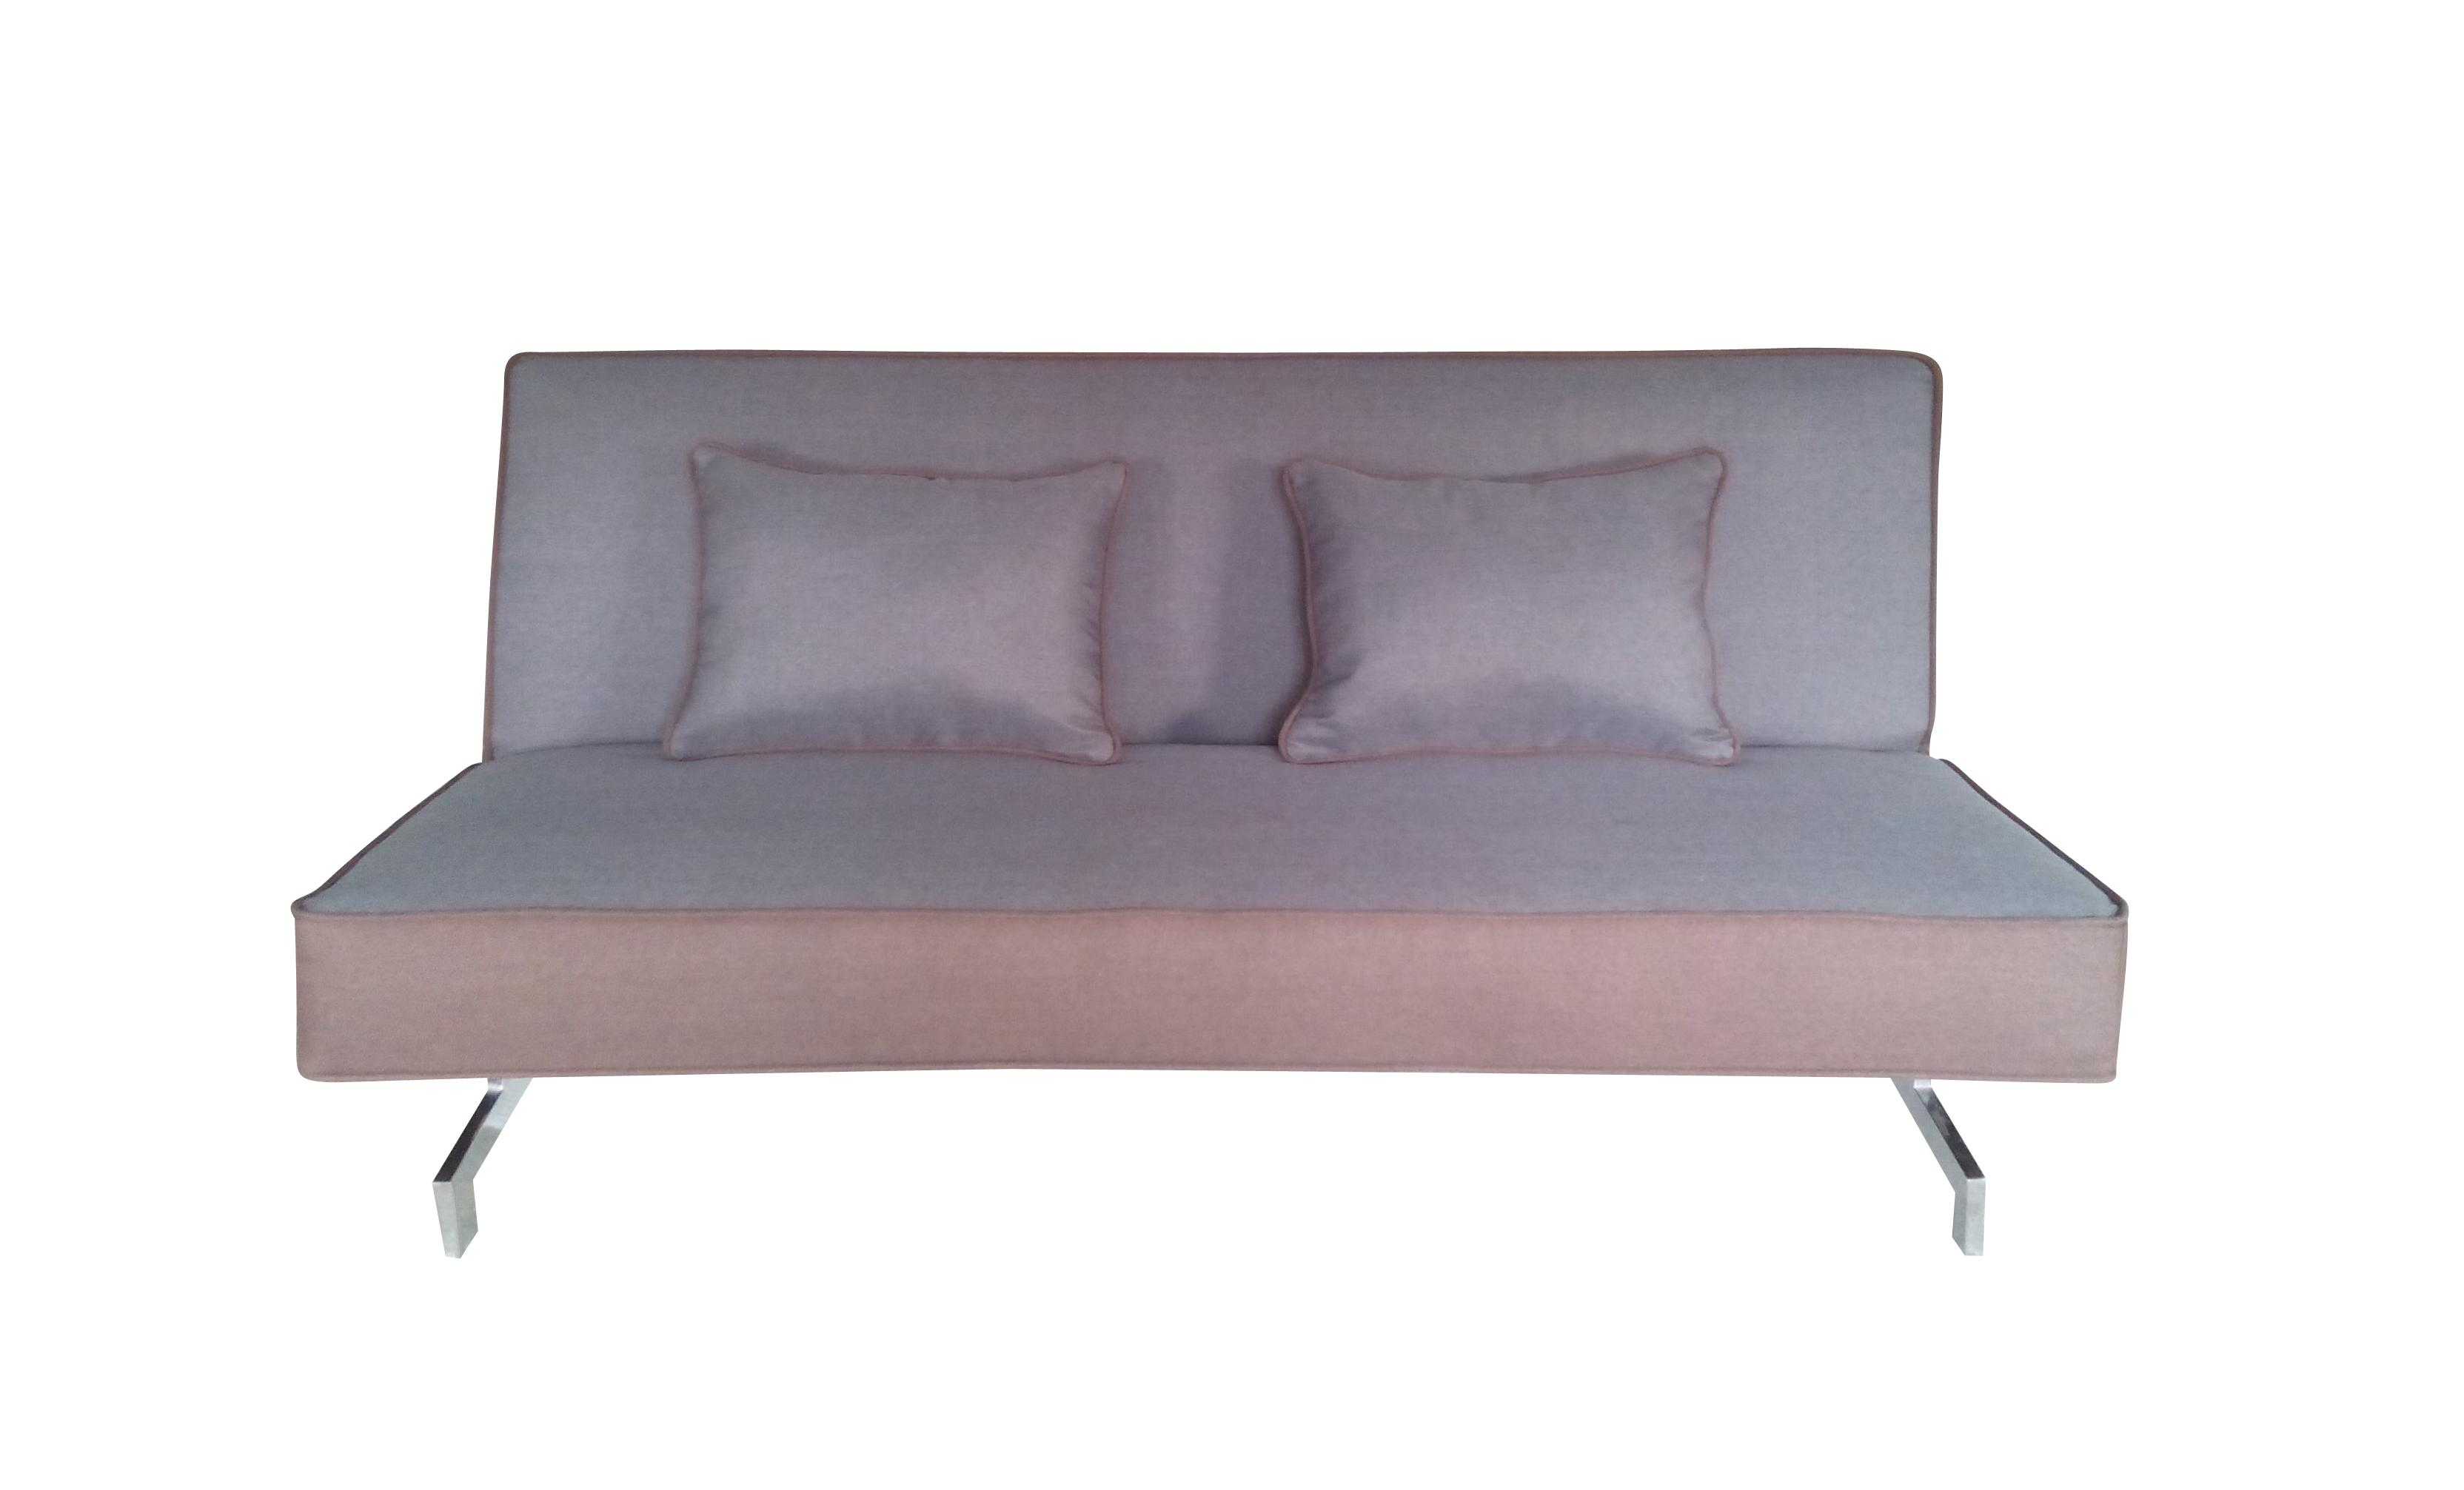 megaimports furniture distribution centre wholesale. Black Bedroom Furniture Sets. Home Design Ideas